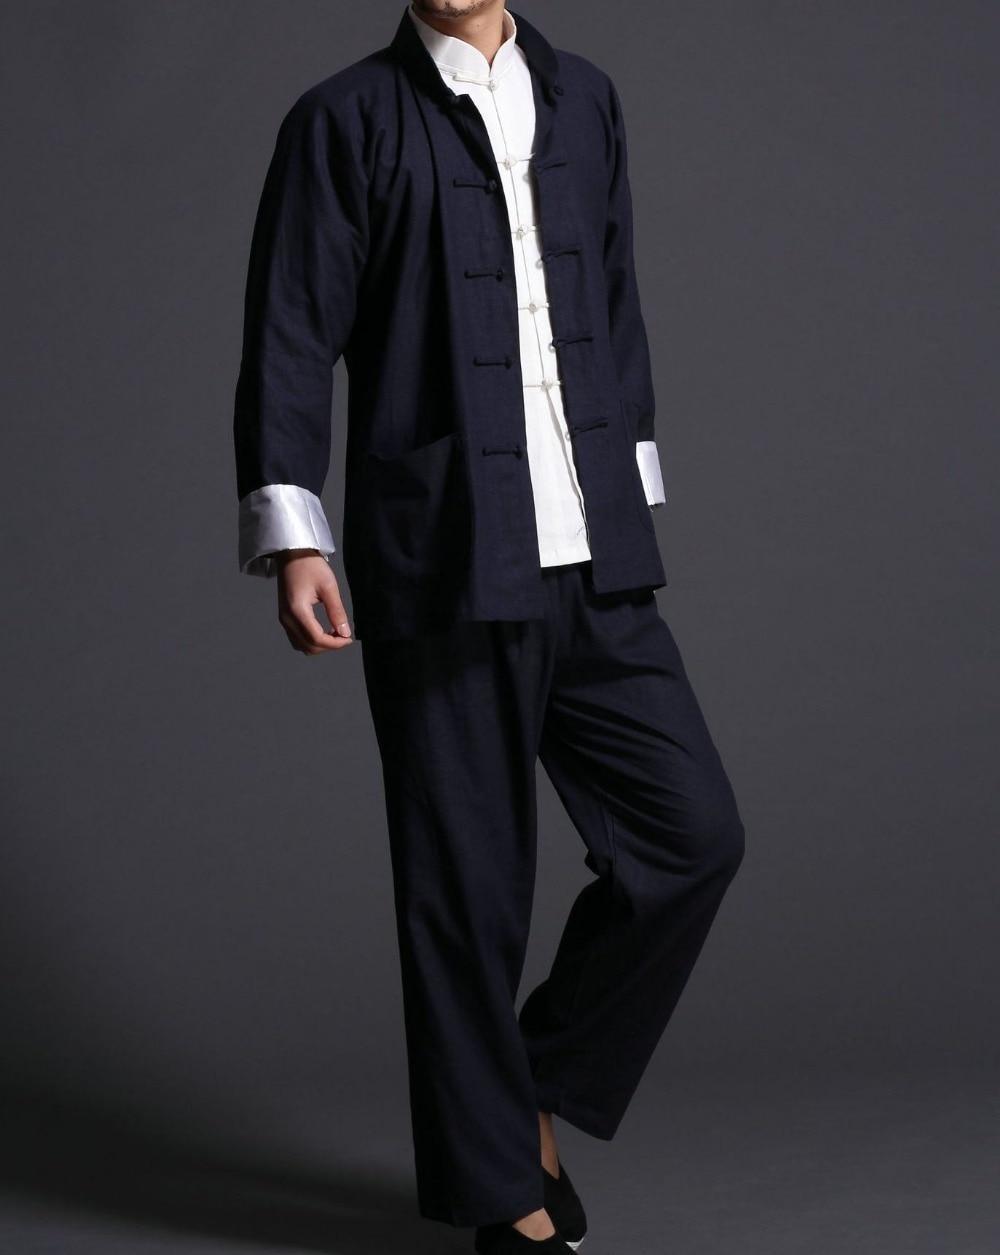 men-male-traditional-tang-suits-Martial-arts-tai-chi-clothing-sets-kung-fu-uniforms-souvenir-wing